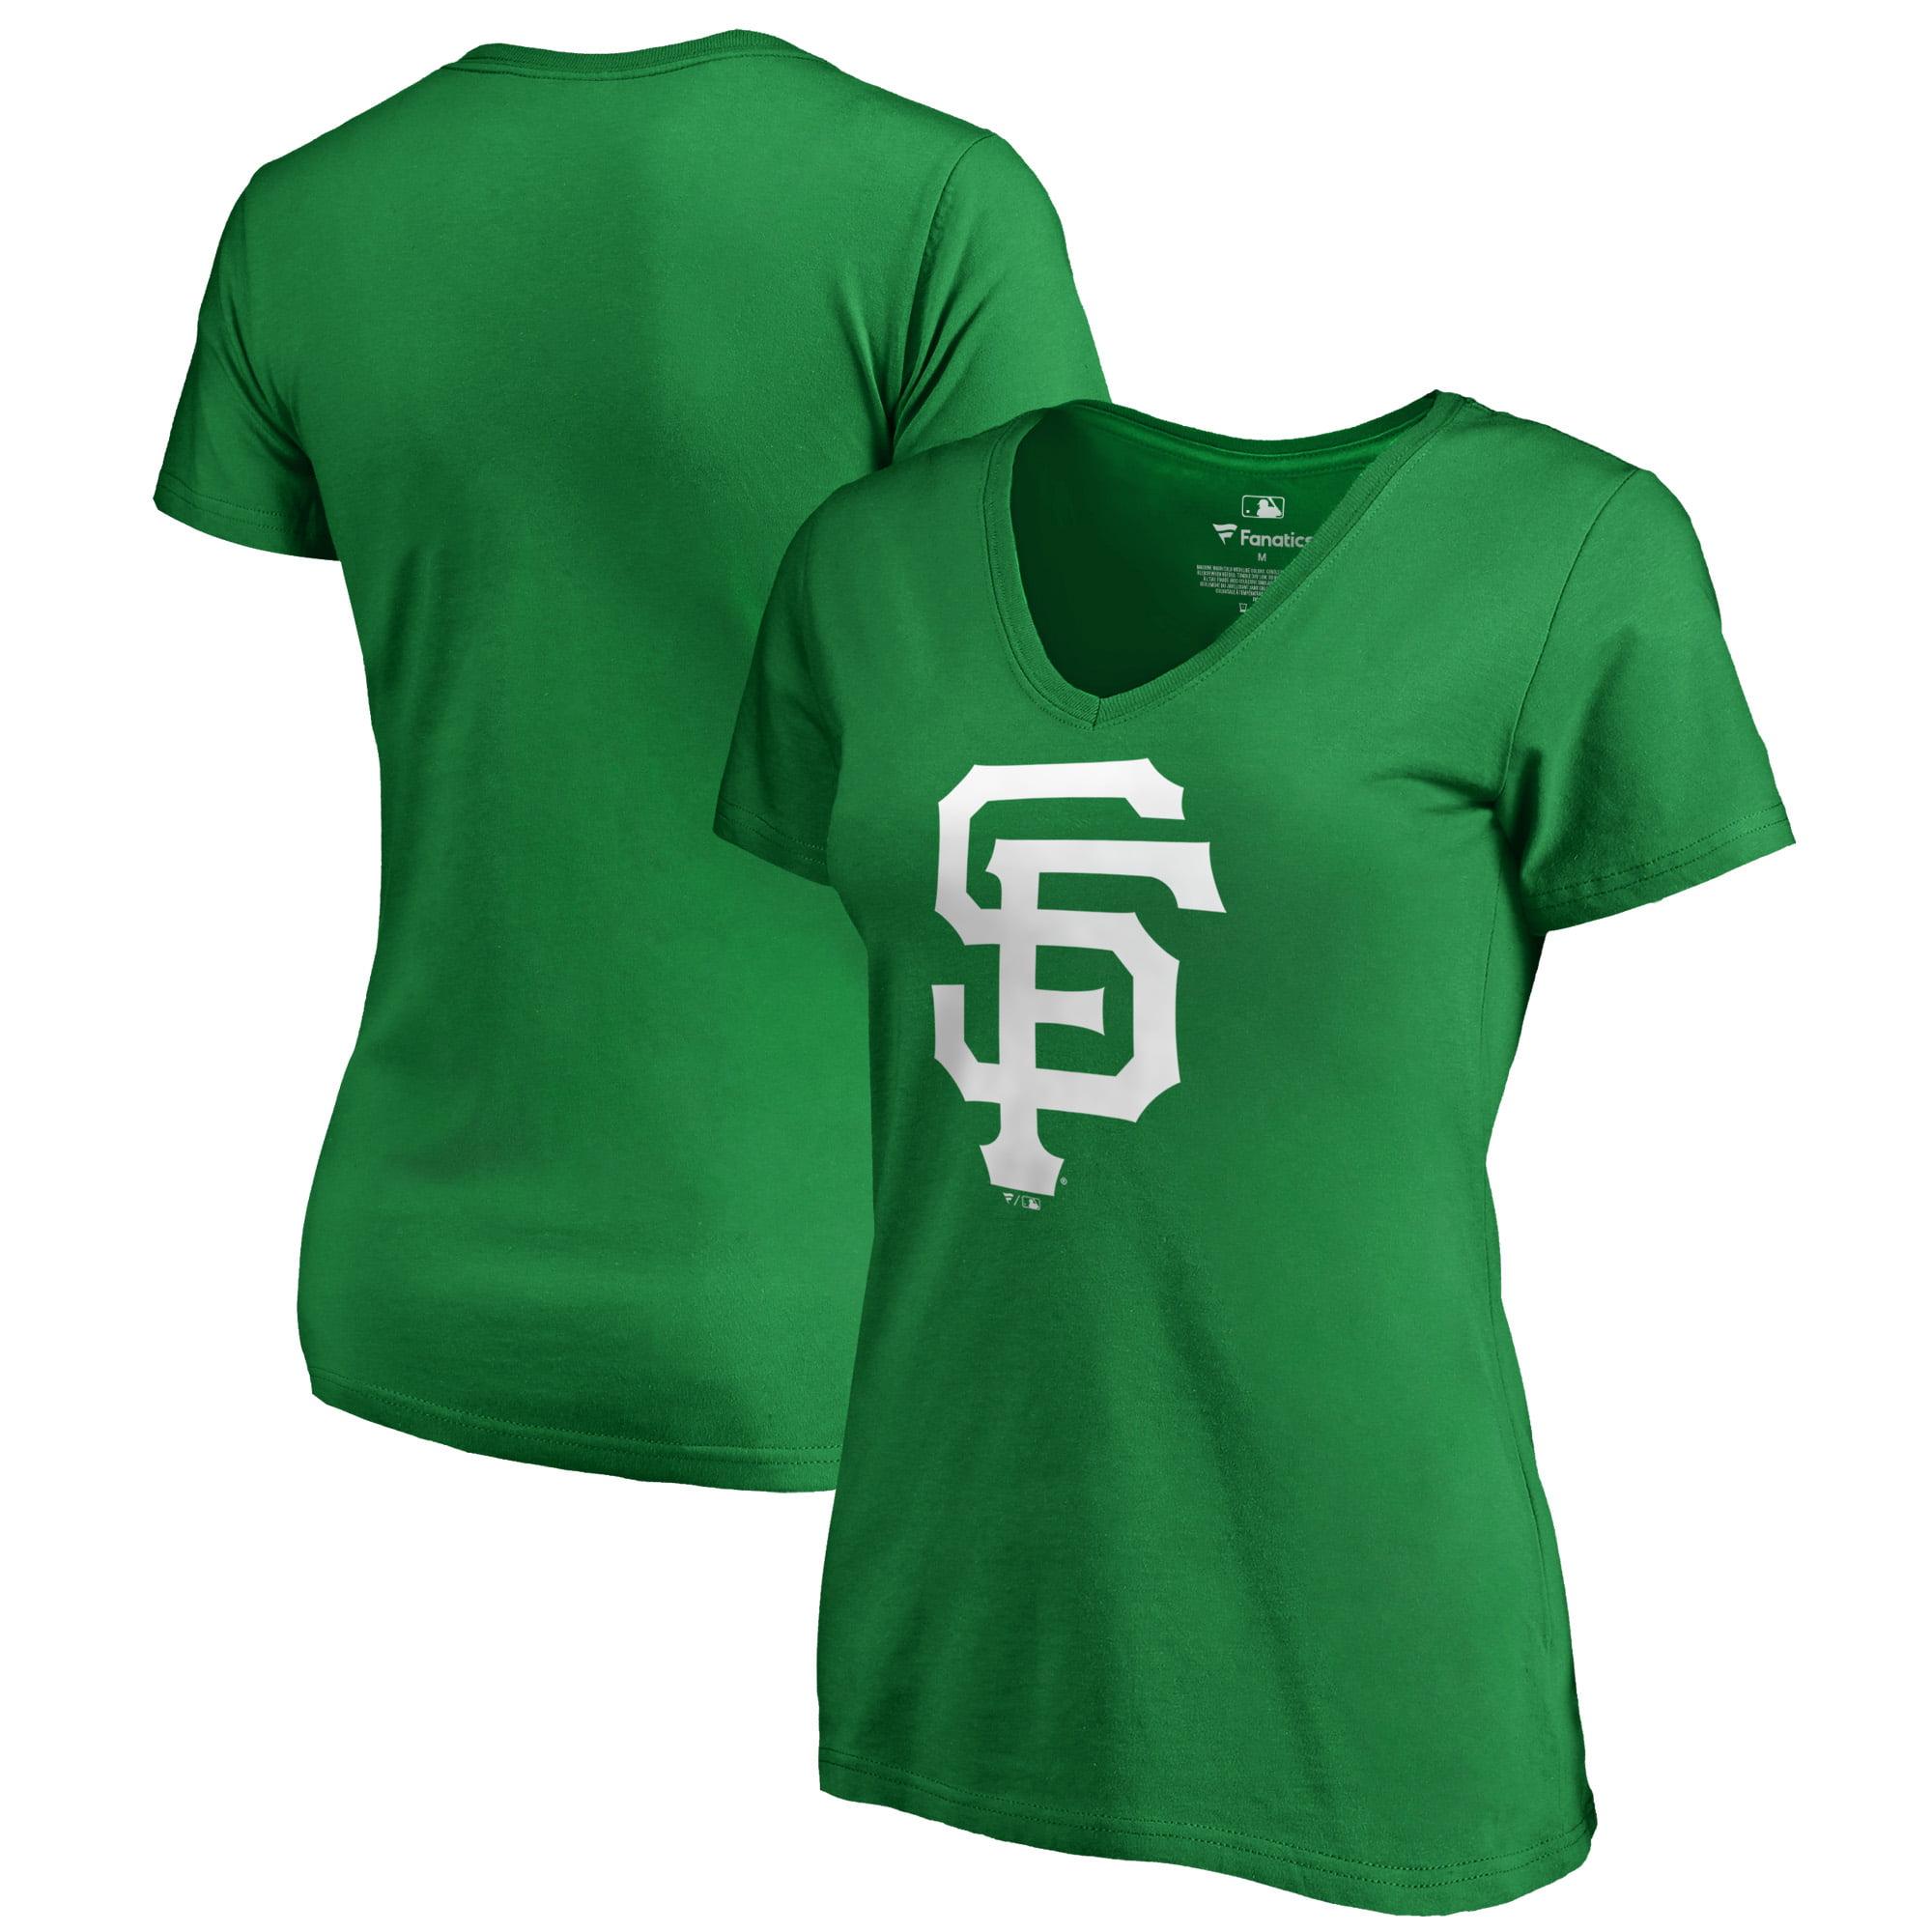 San Francisco Giants Fanatics Branded Women's St. Patrick's Day White Logo Plus Size V-Neck T-Shirt - Kelly Green